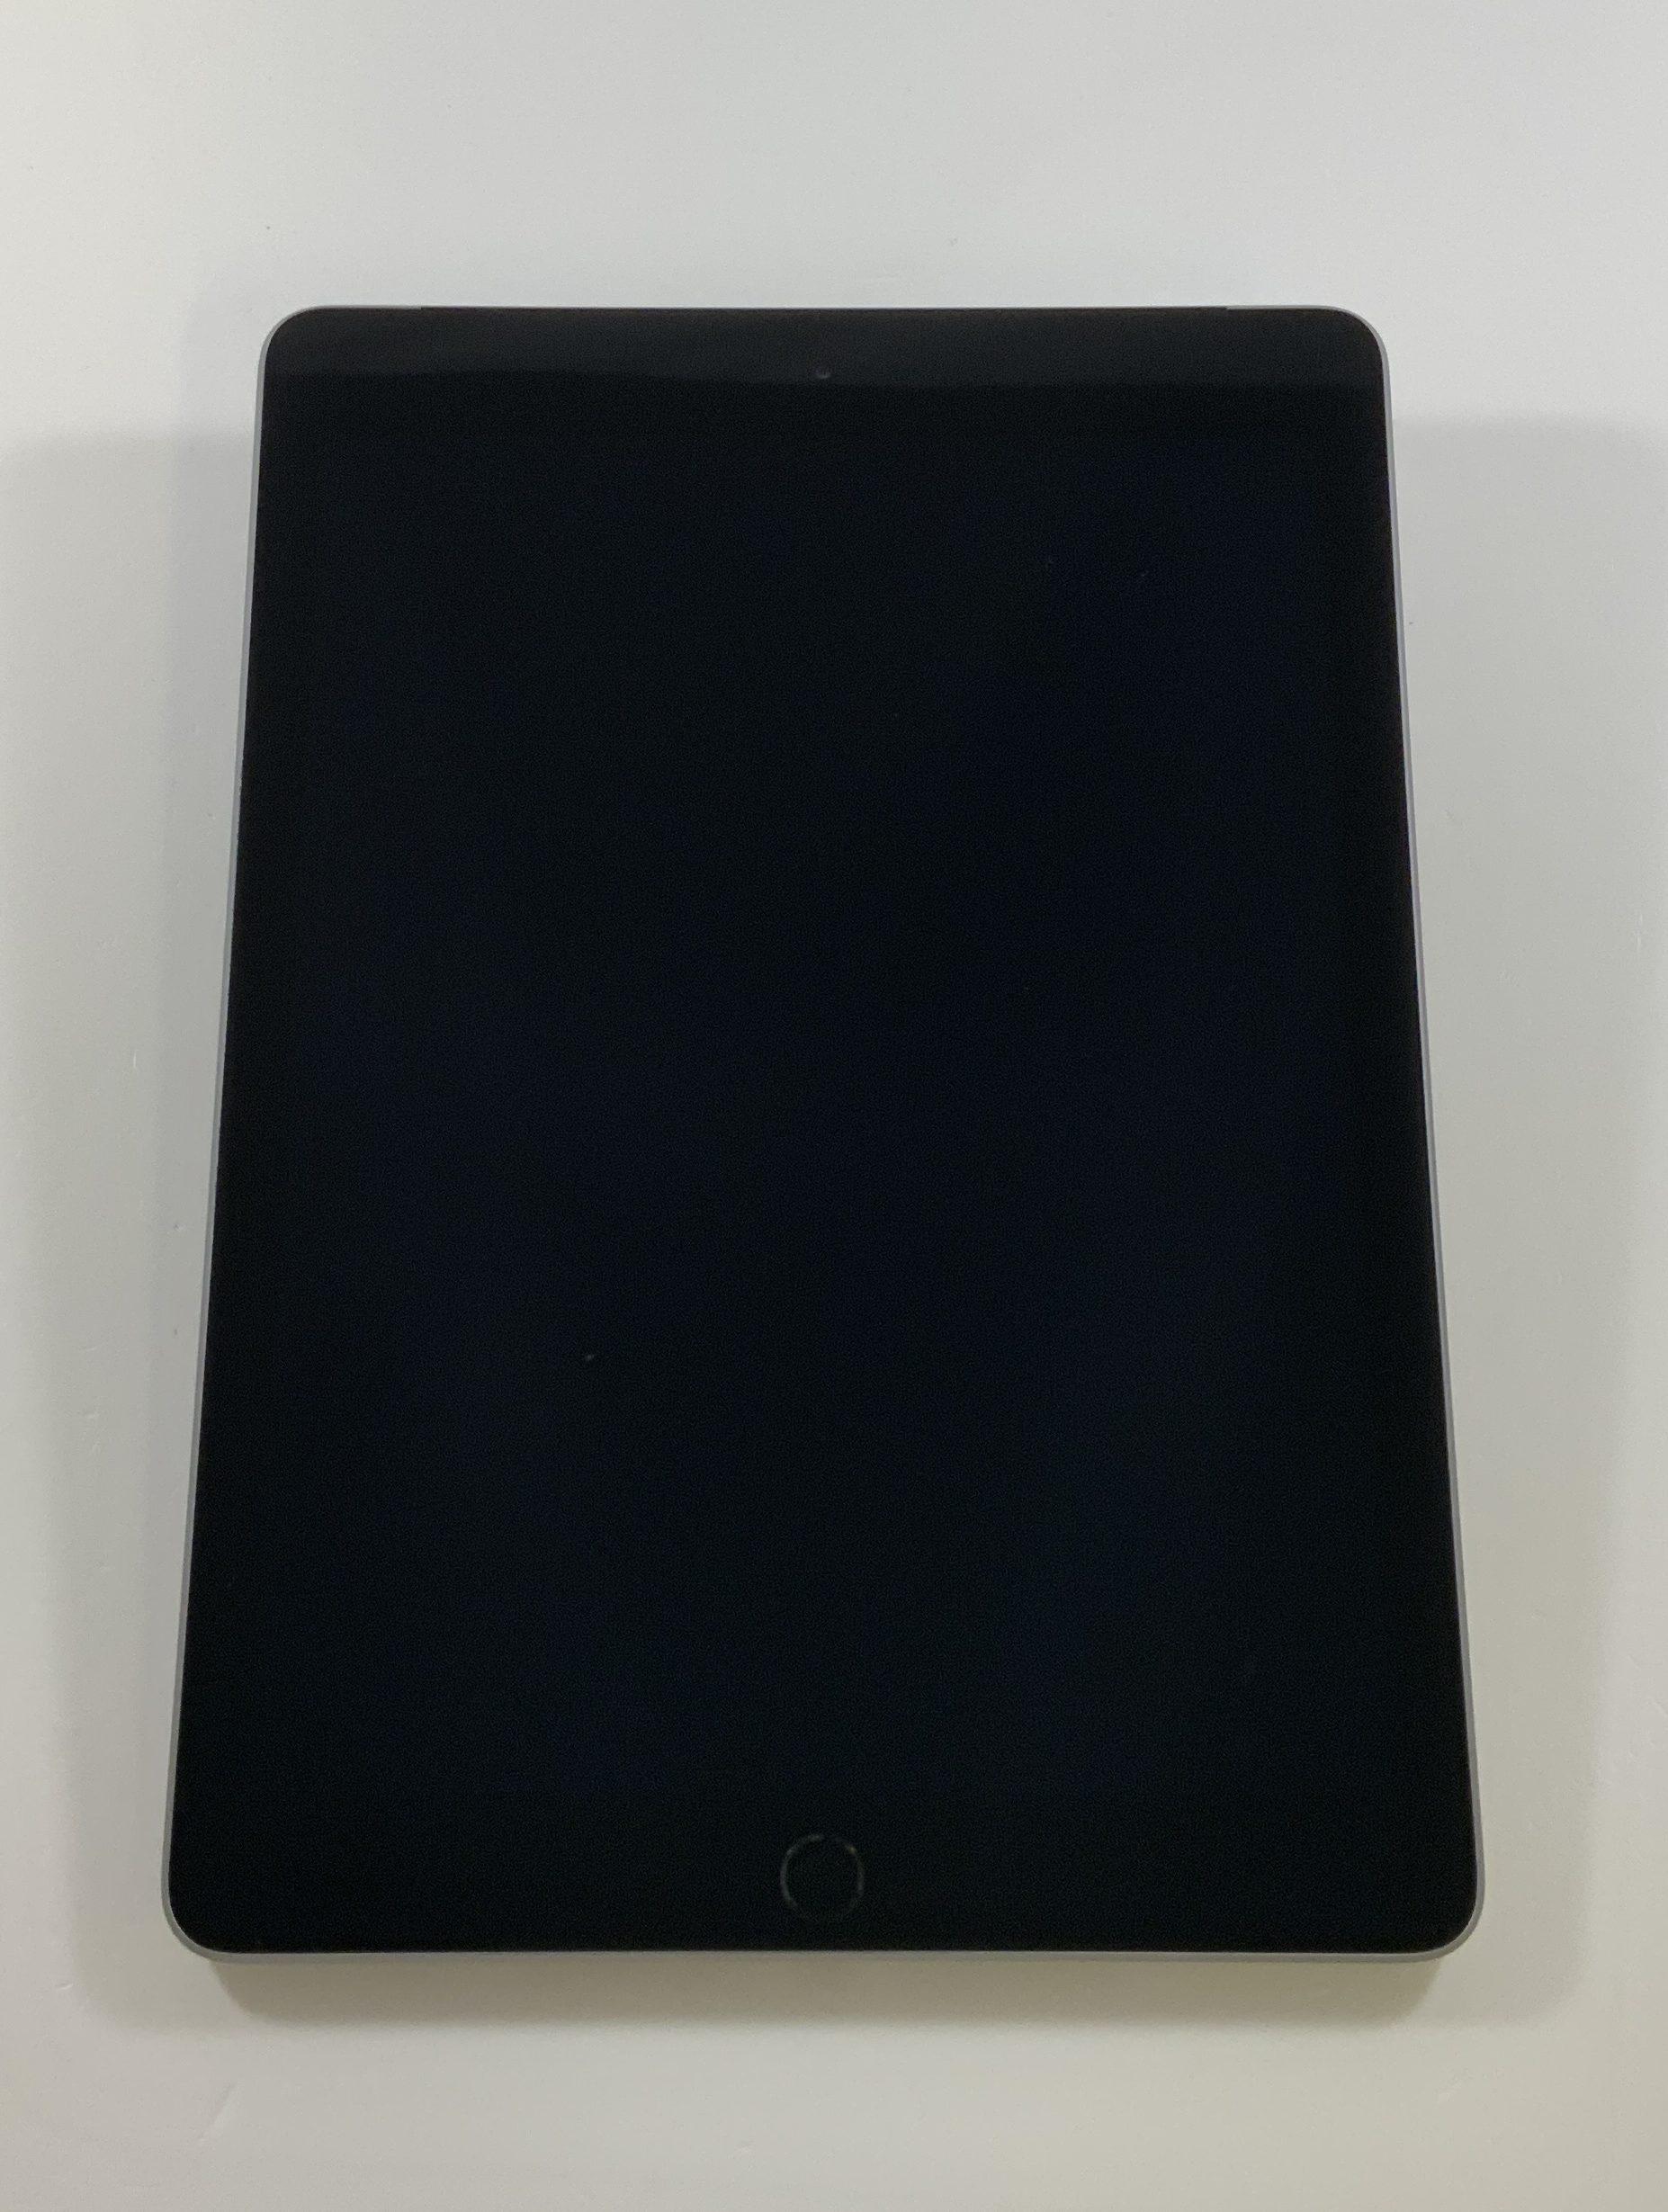 iPad 5 Wi-Fi + Cellular 128GB, 128GB, Space Gray, bild 1